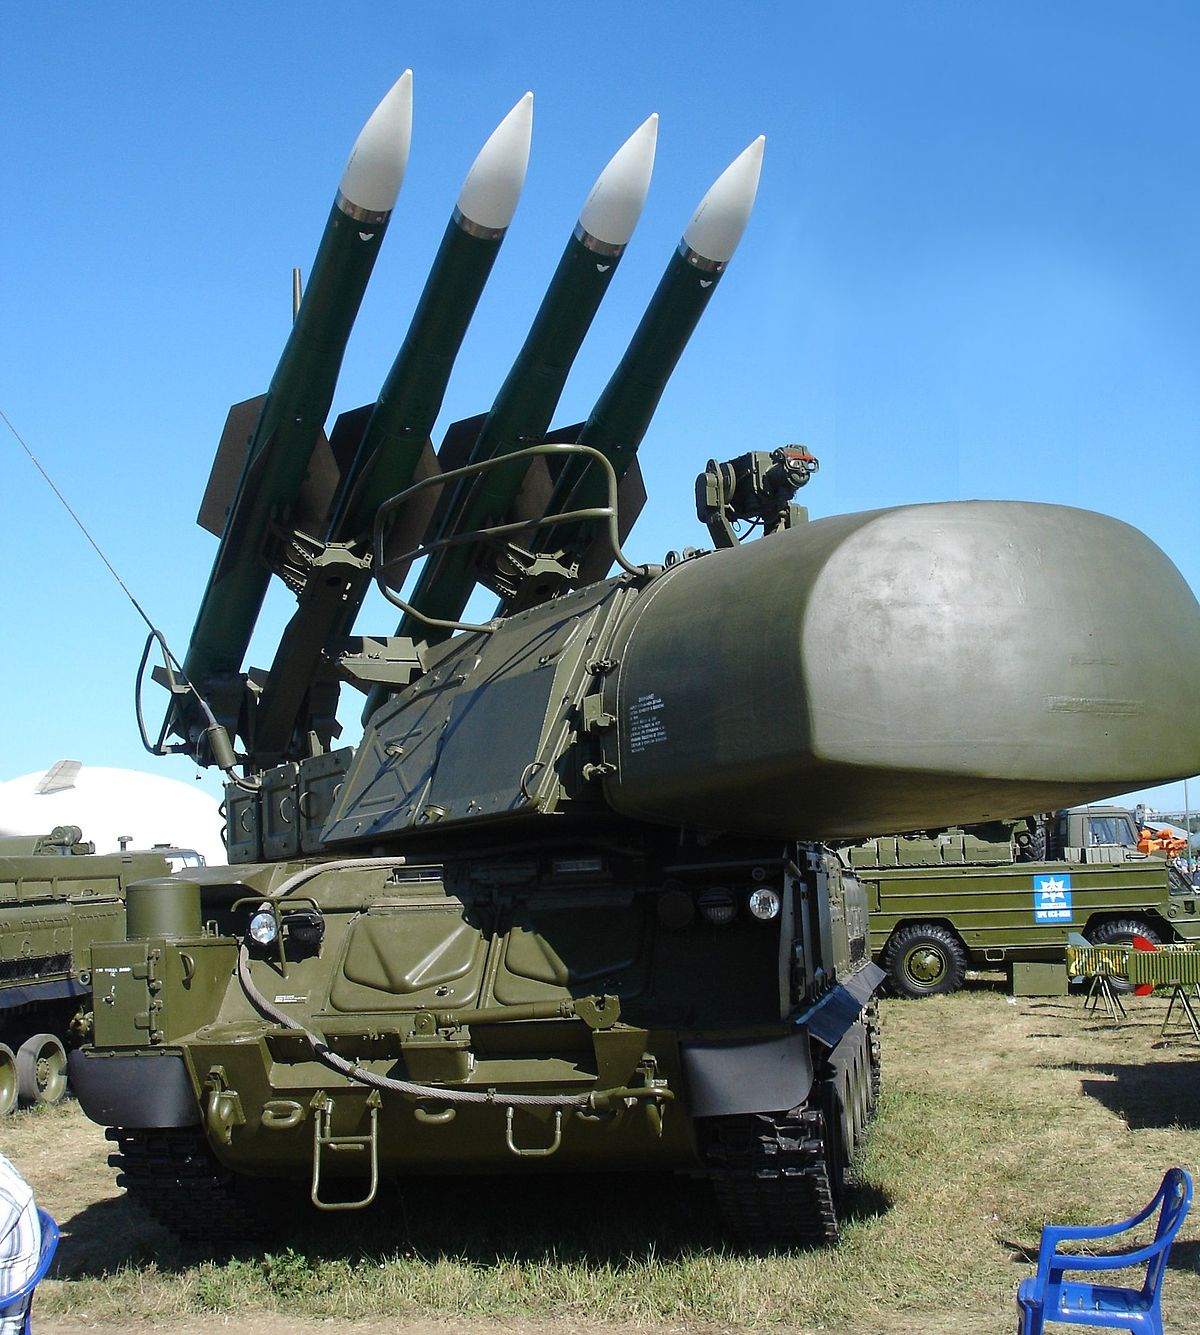 Buk-M1-2 9A310M1-2.jpg